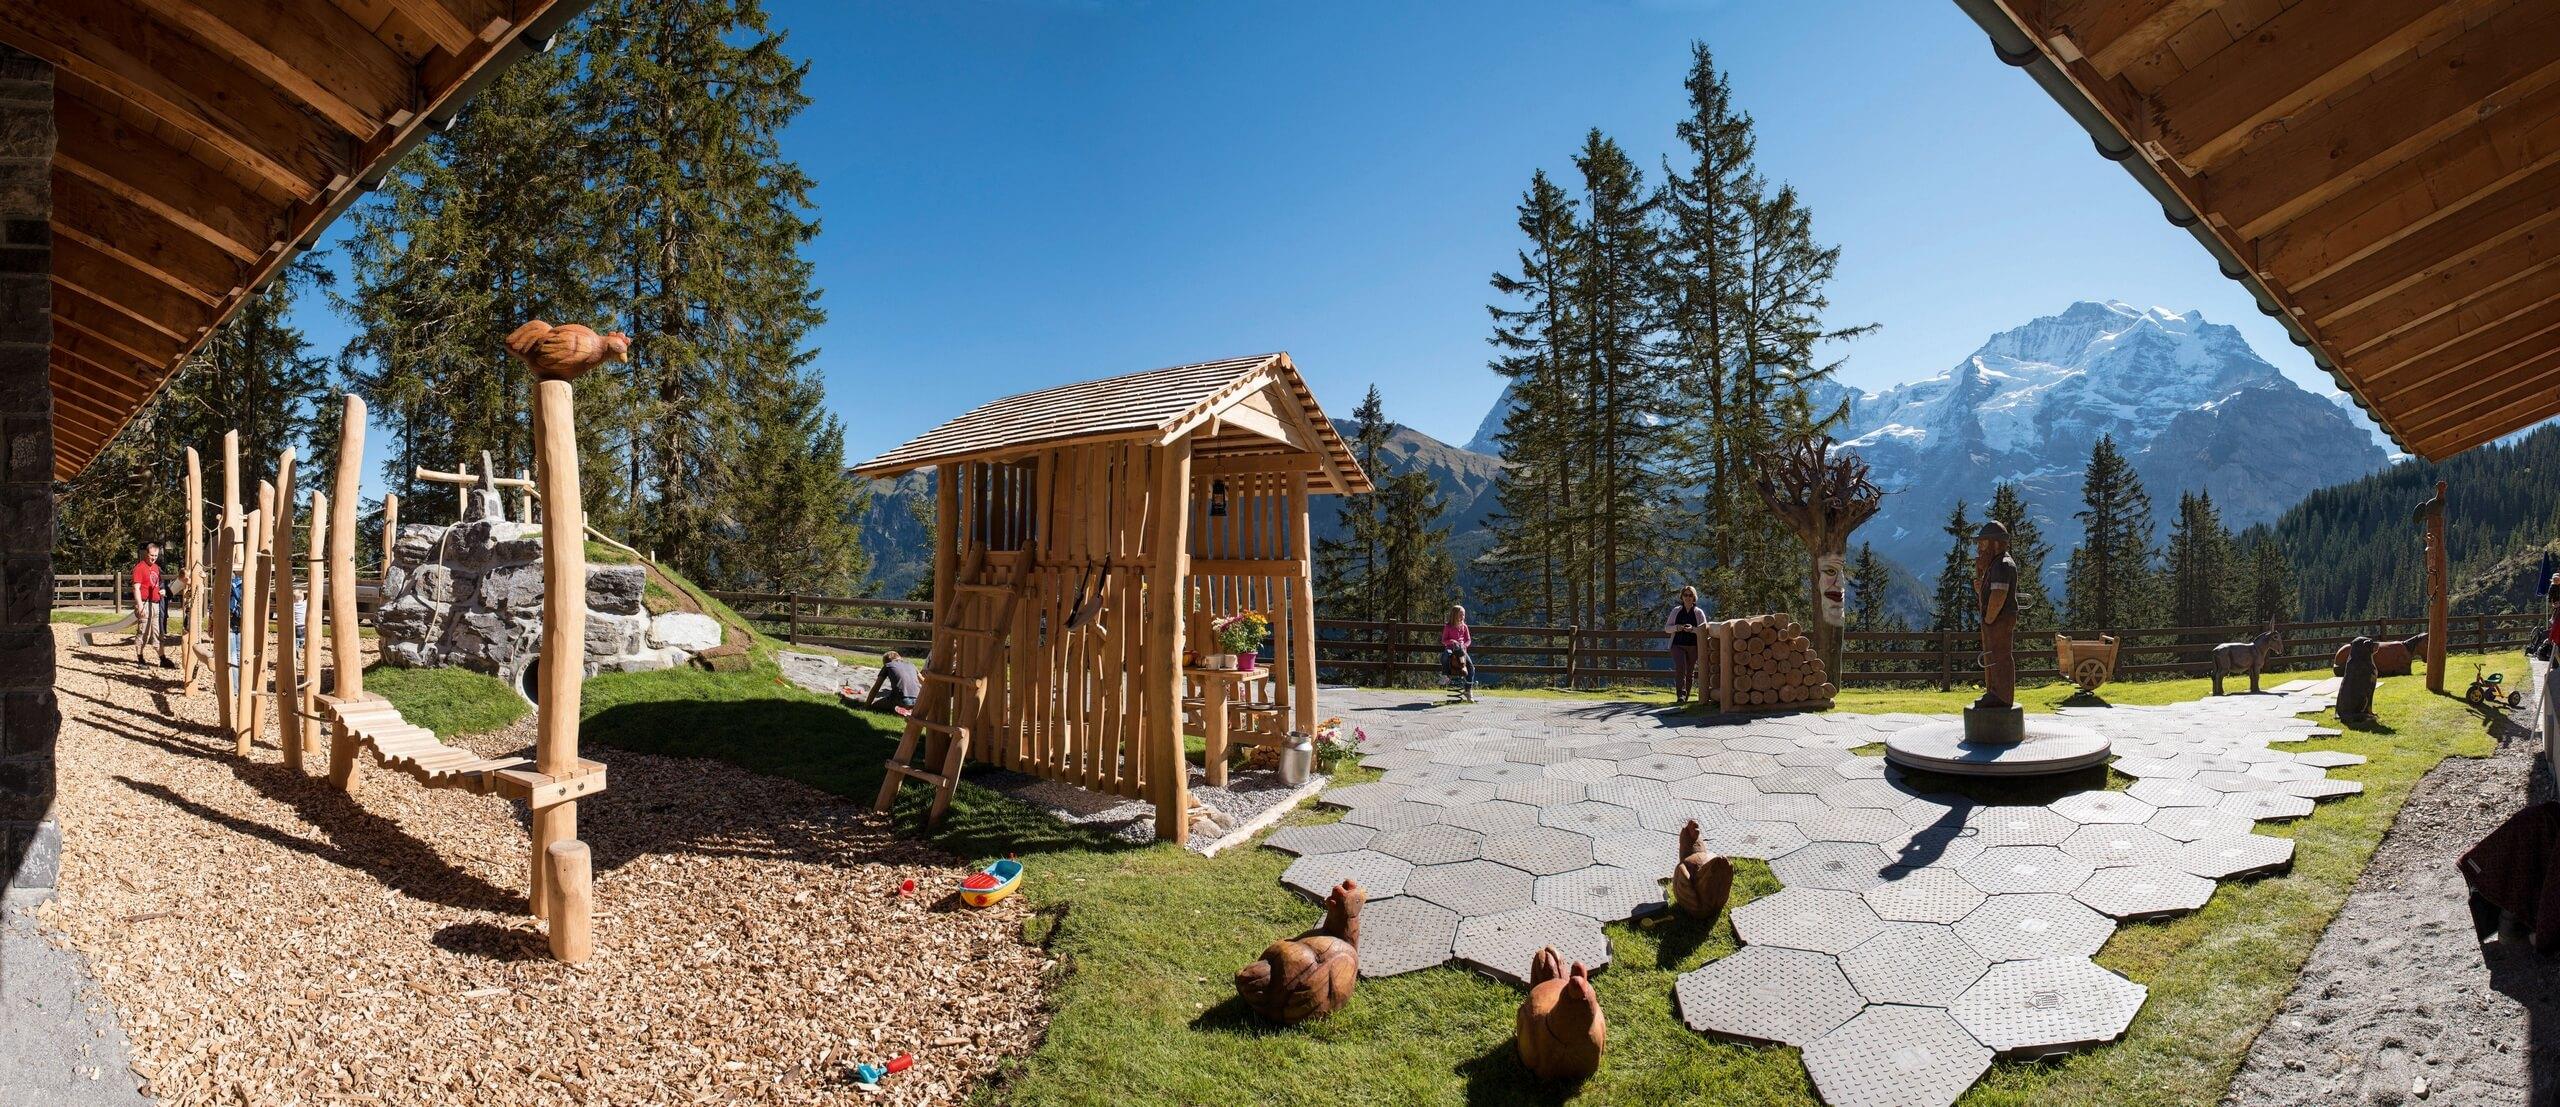 winteregg-restaurant-kinderspielplatz-sommer